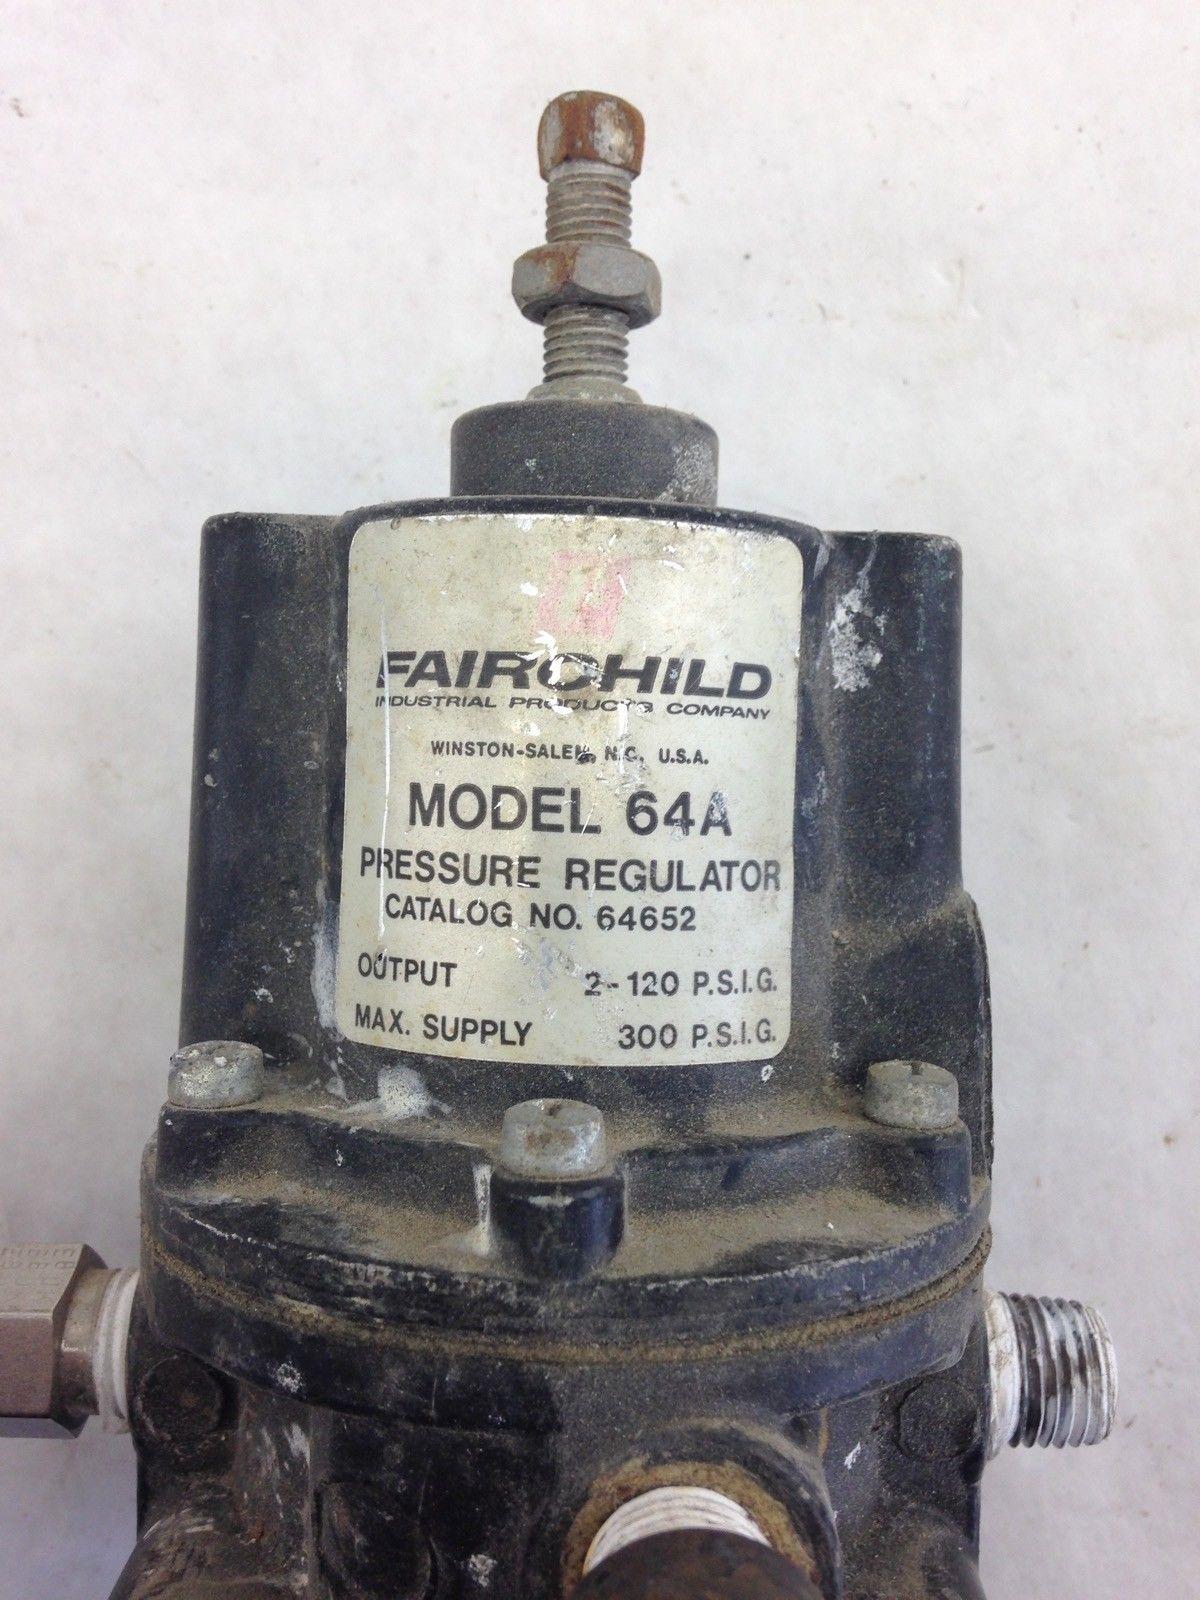 FAIRCHILD 64A PRESSURE REGULATOR (B443) 2